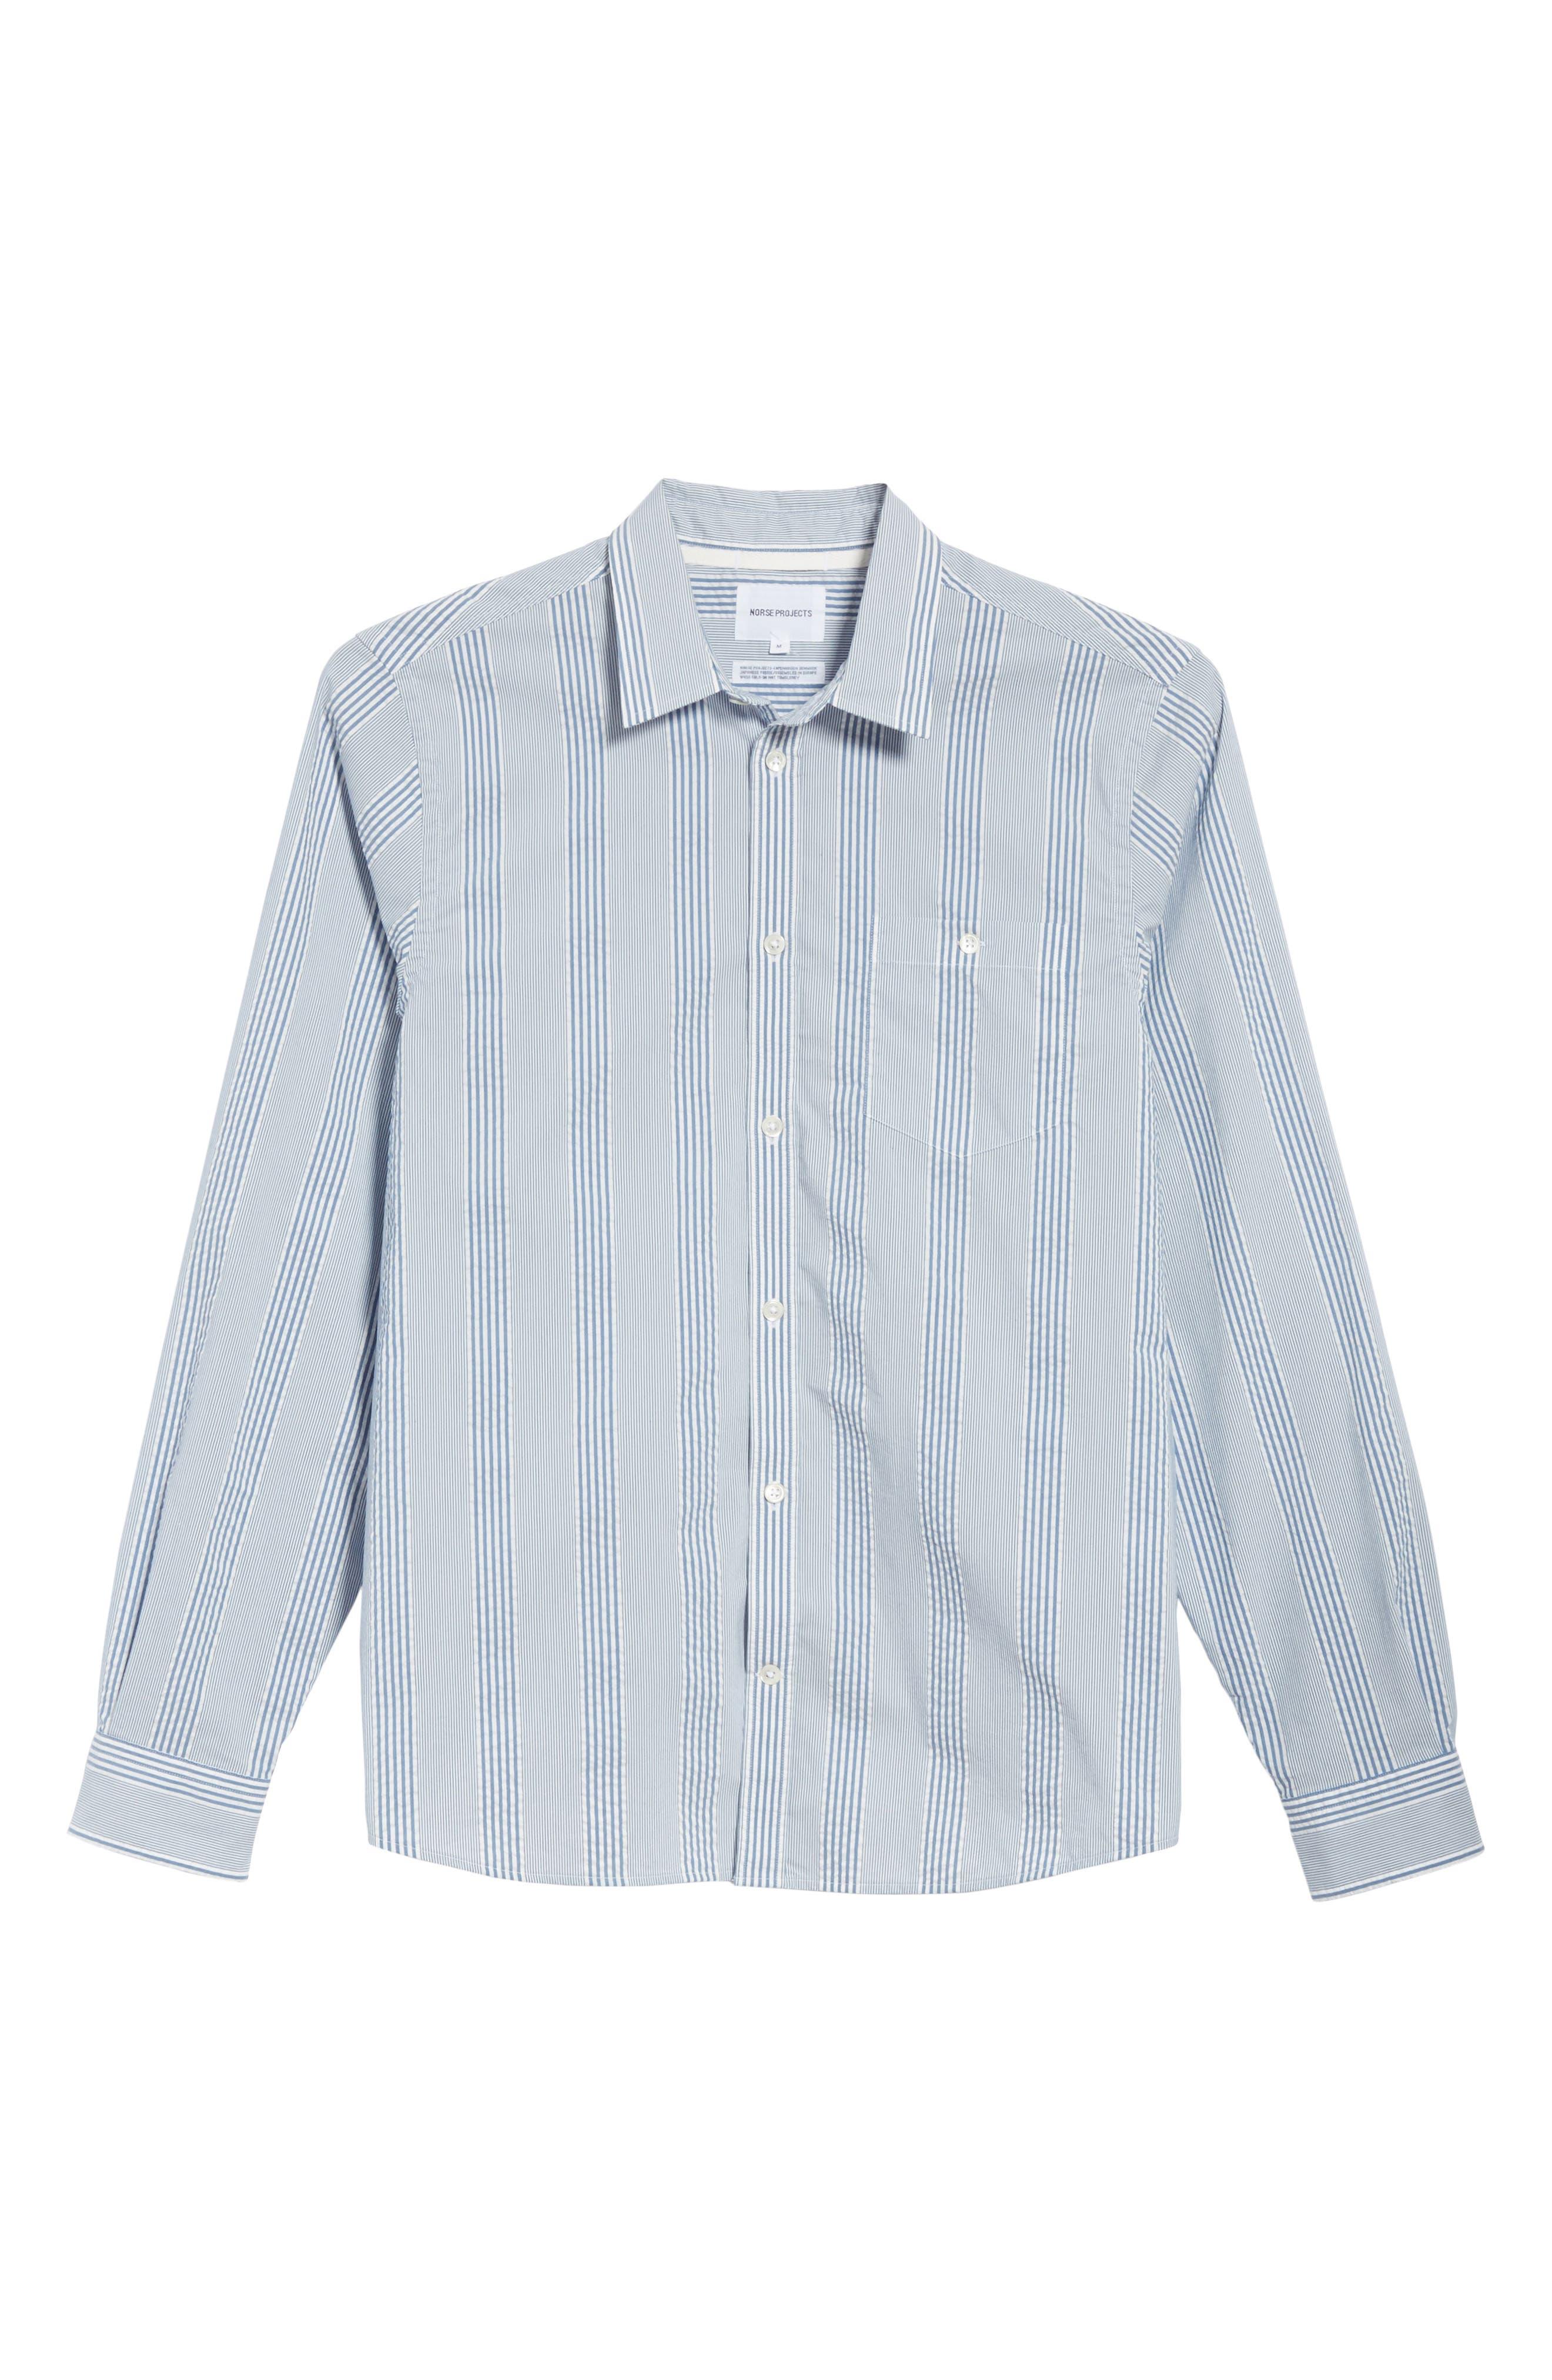 Osvald Seersucker Shirt,                             Alternate thumbnail 6, color,                             Luminous Blue